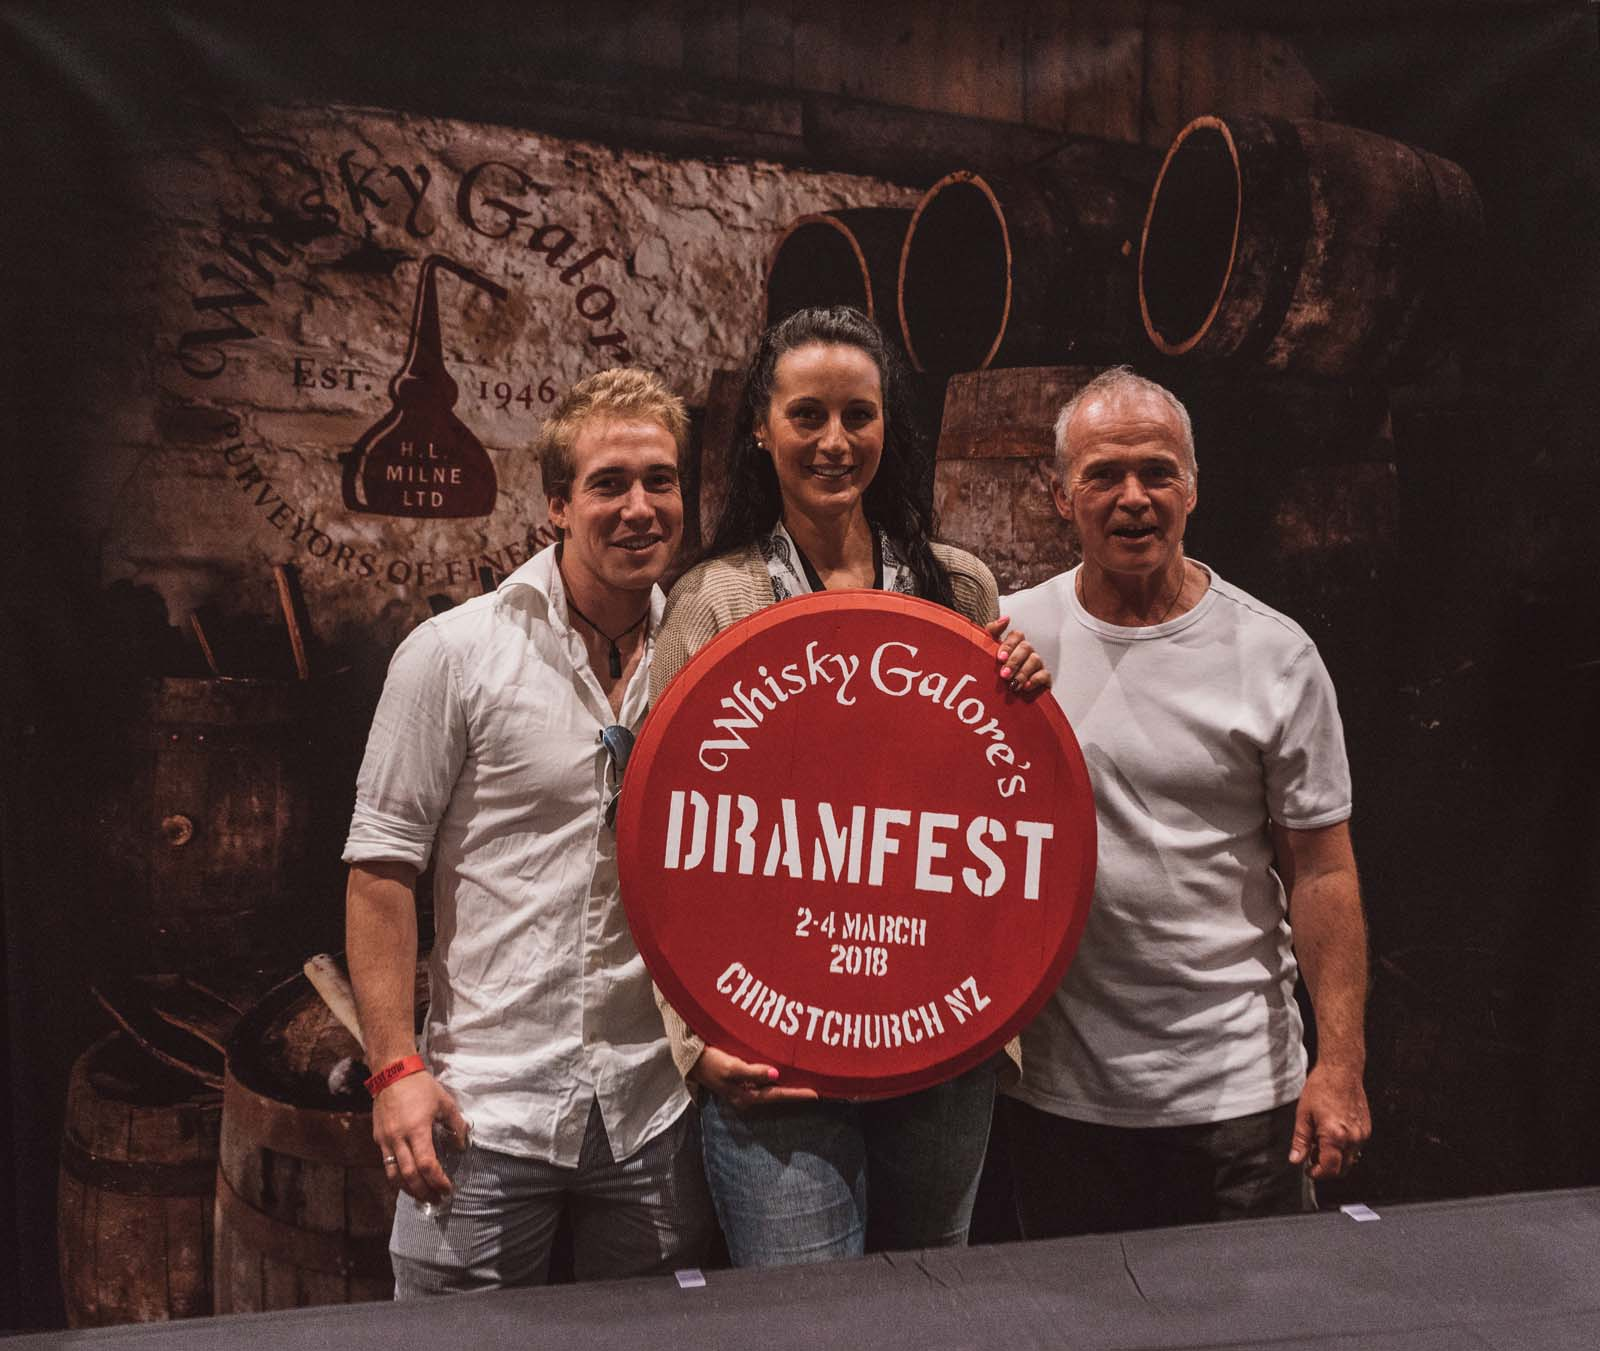 Dramfest 2018 for Whisky Galore-354.jpg